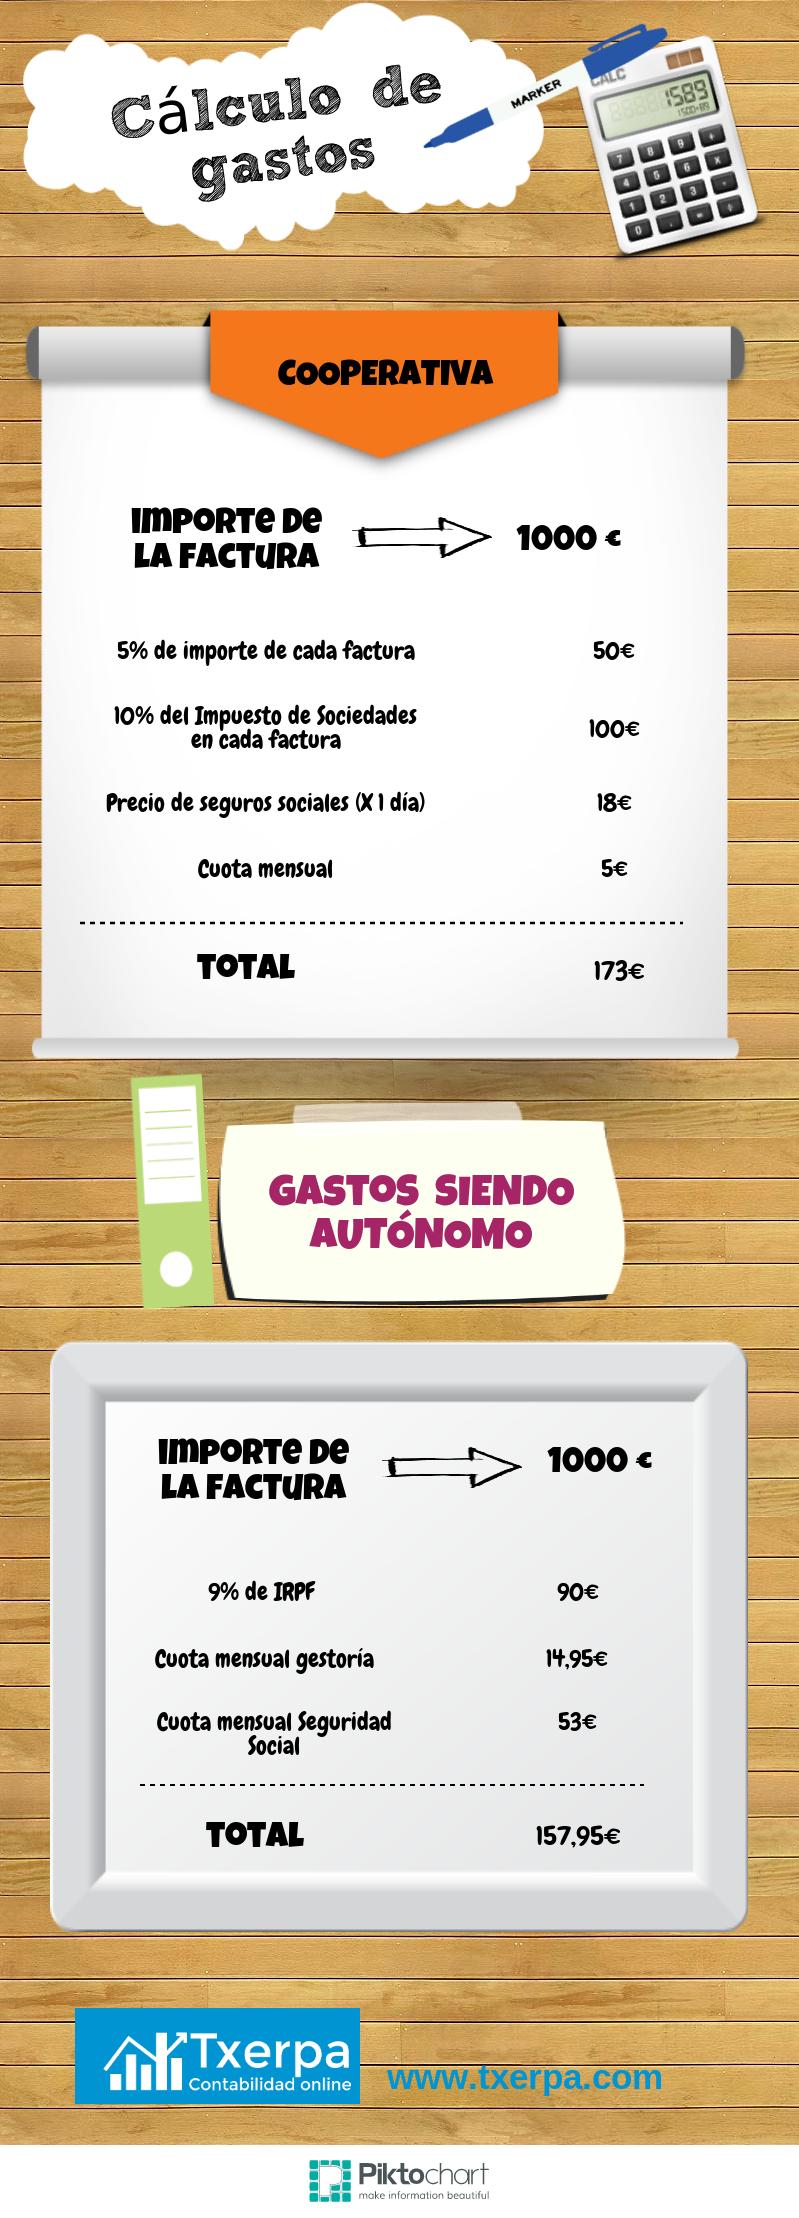 ventajas_desventajas_cooperativa_freelance_autonomo.png